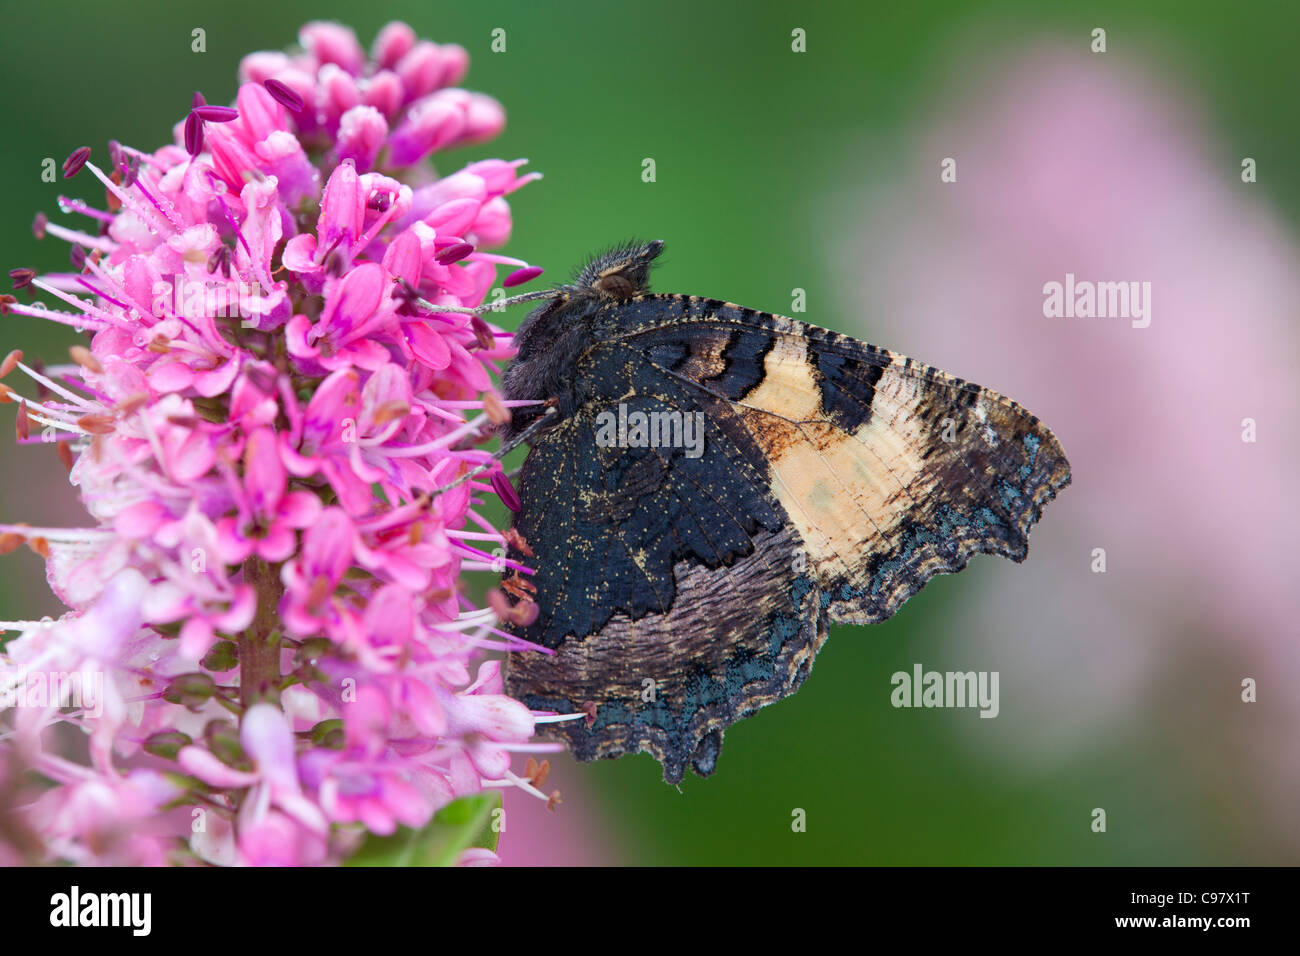 Small Tortoiseshell Butterfly; Aglais urticae; UK; on hebe flower - Stock Image